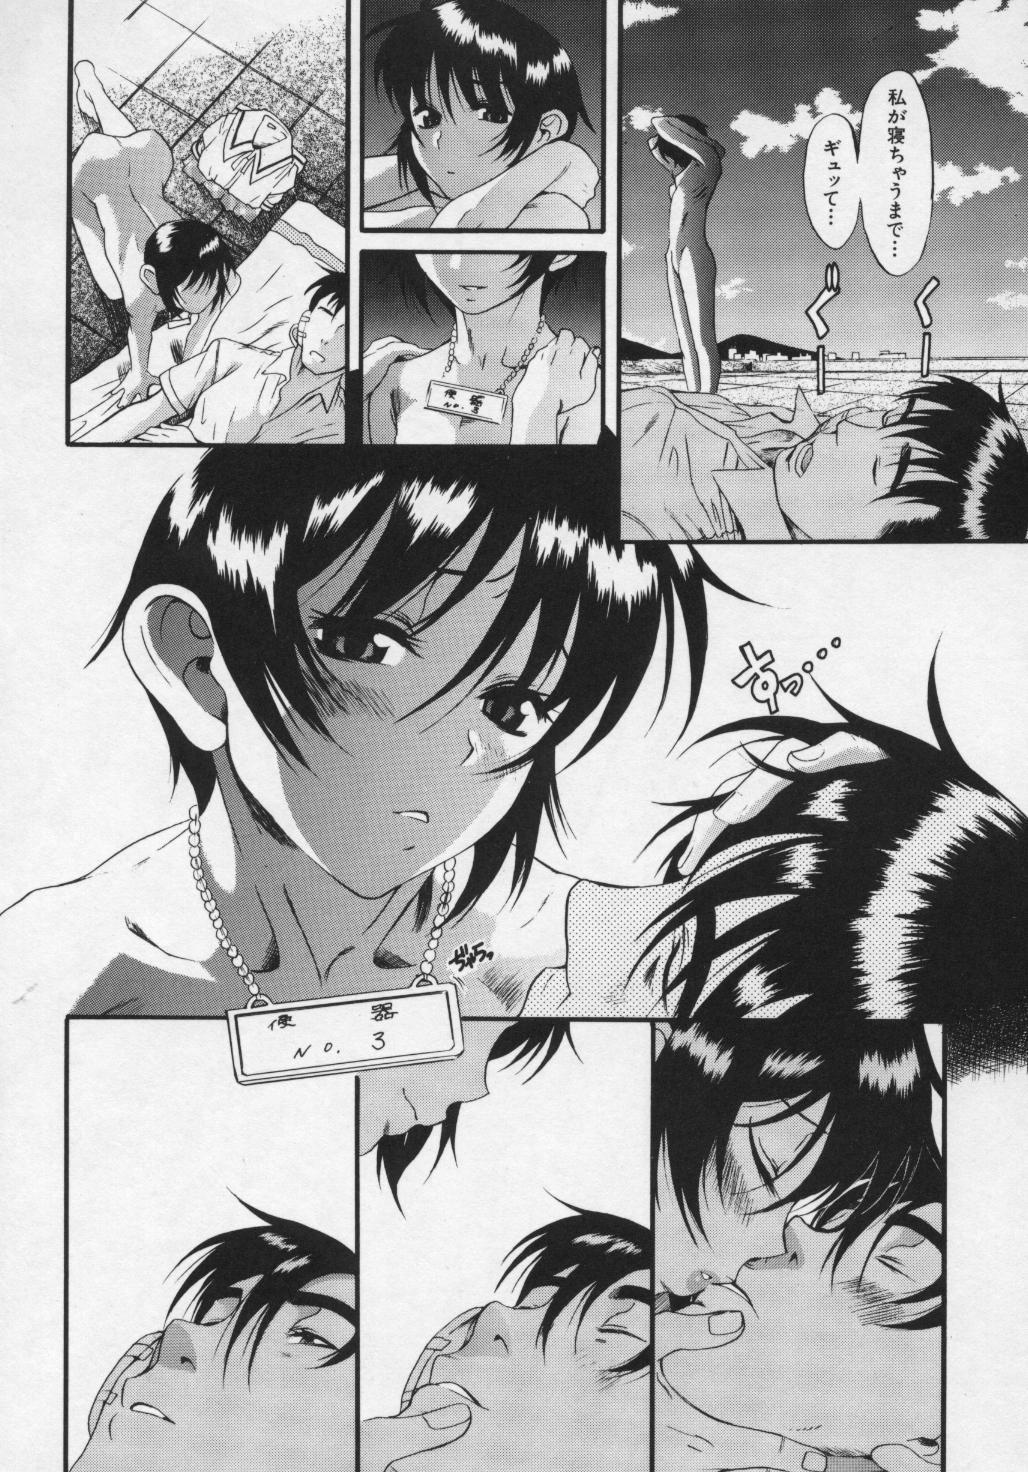 Kimi no Na o Yobeba - If I call your name. 96